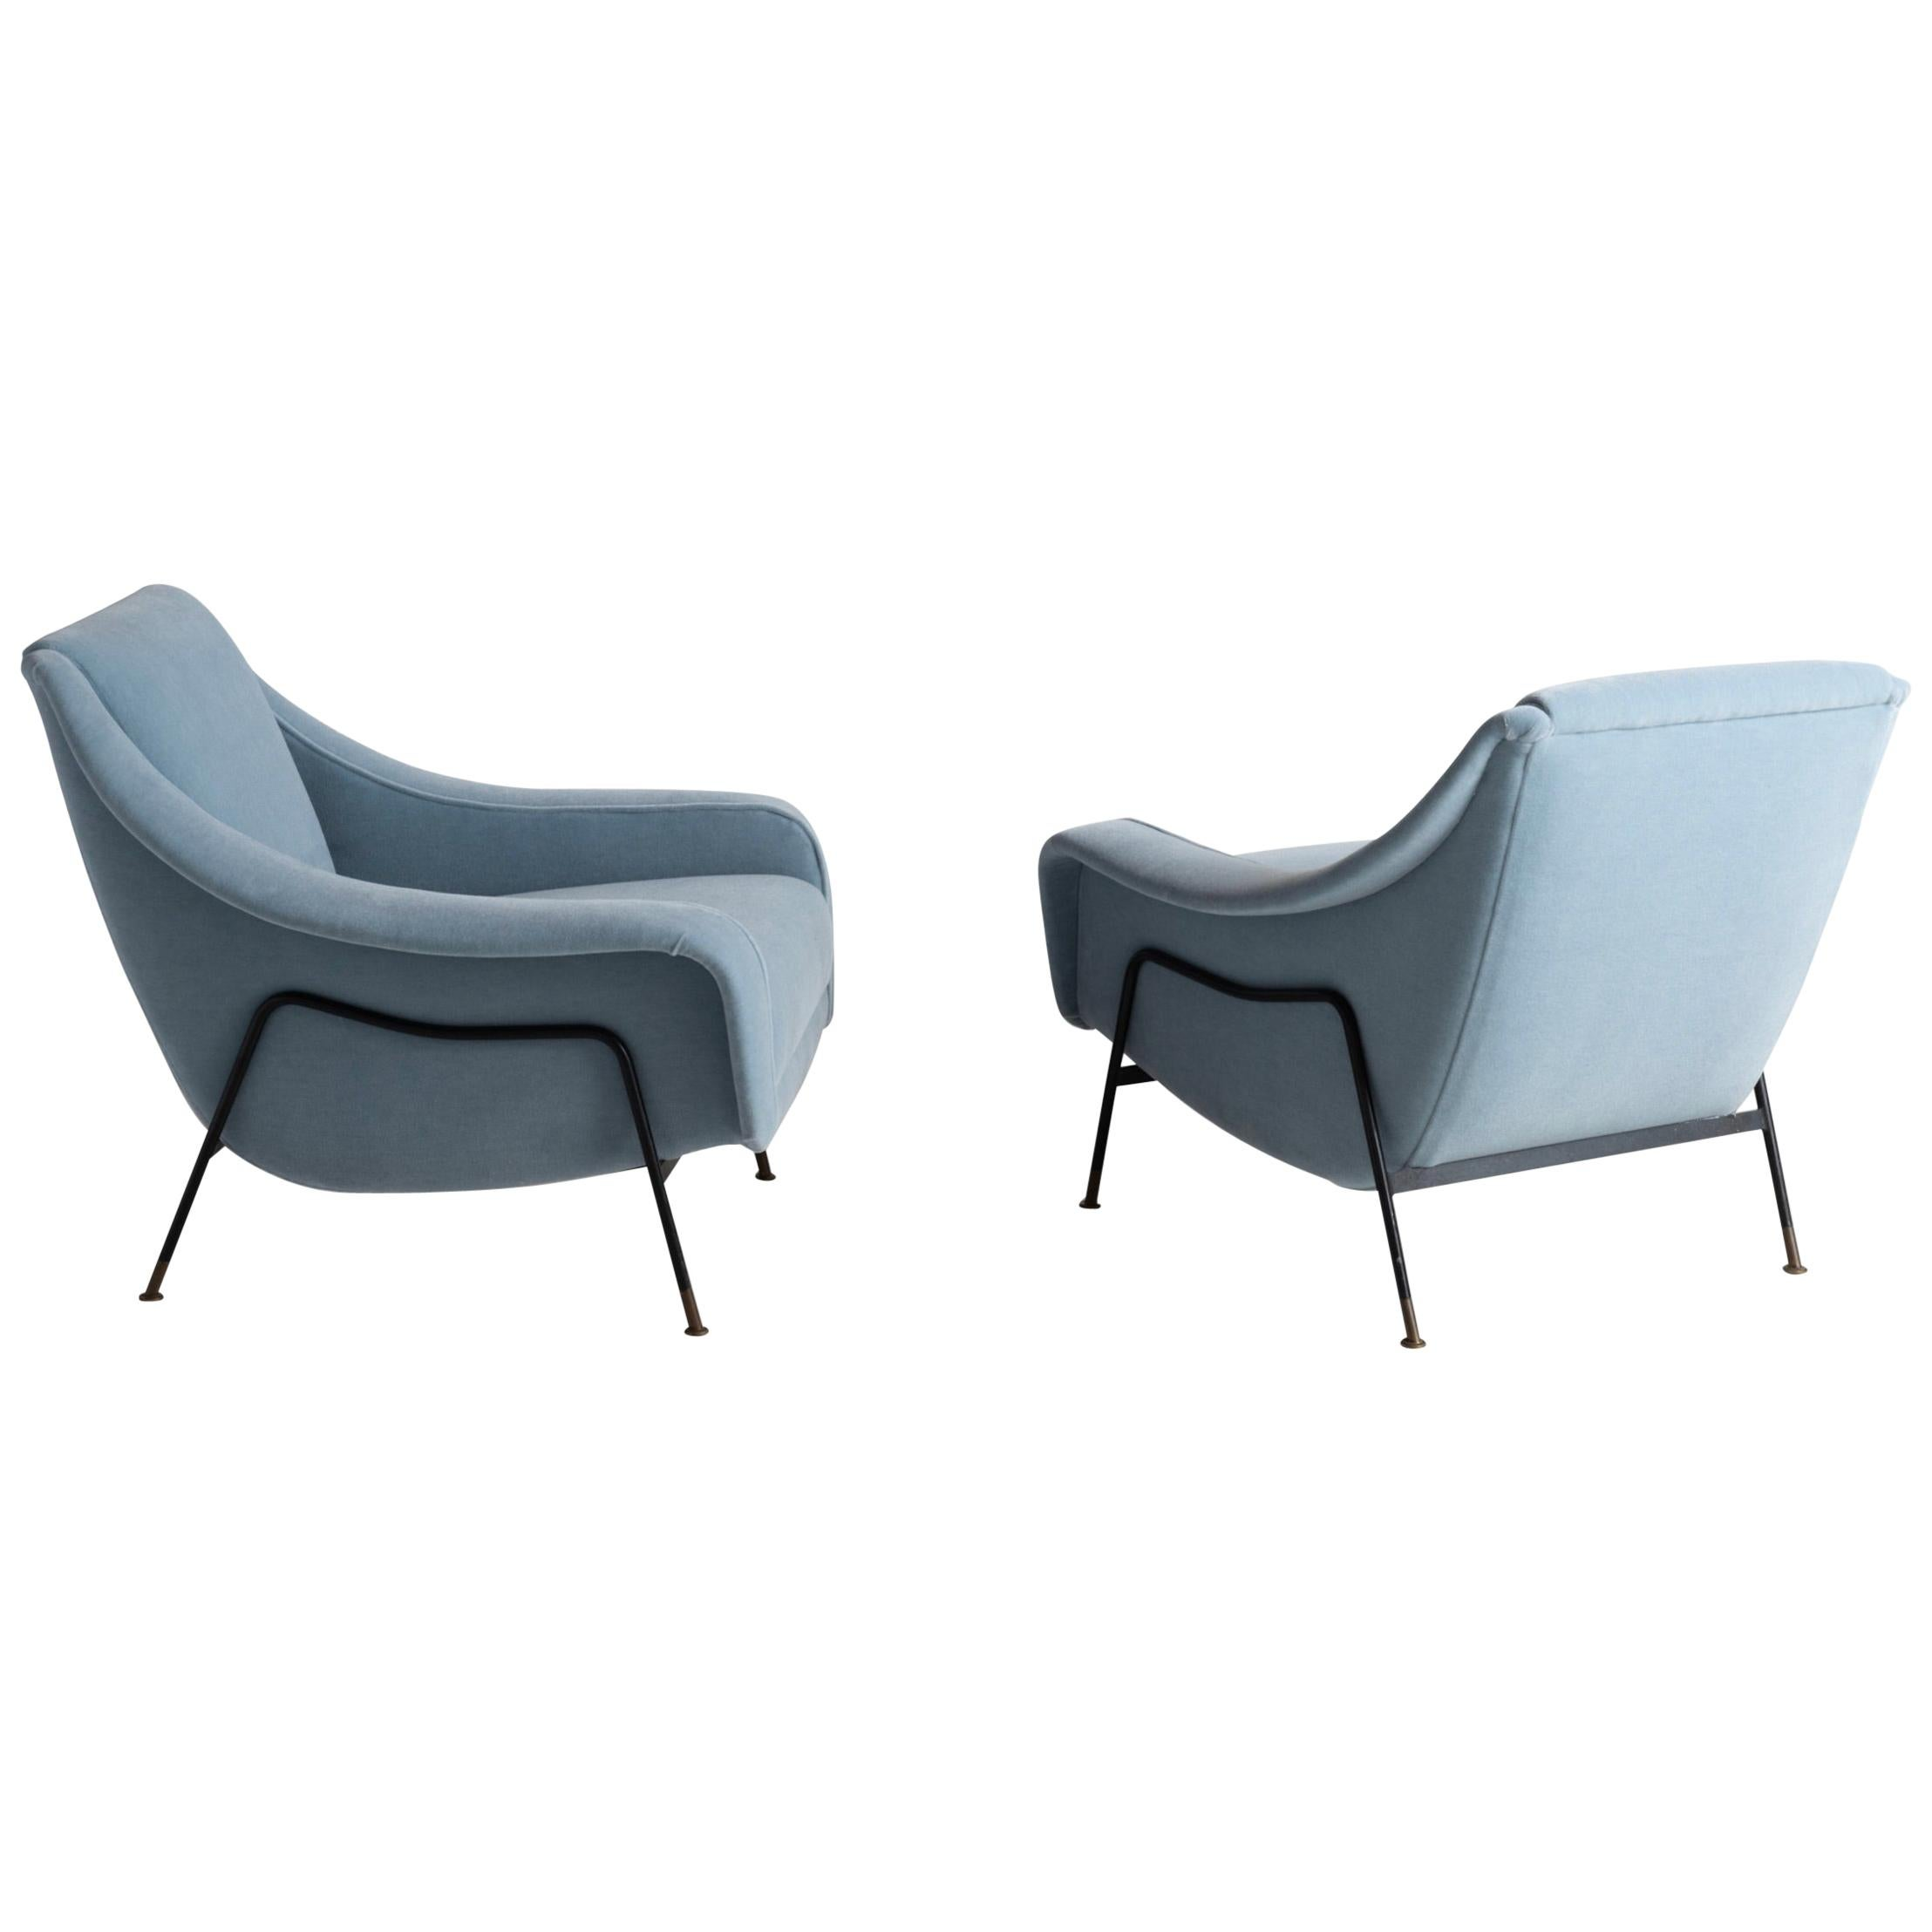 Pair of 1950s Modern Lounge Chairs by Ezio Minotti